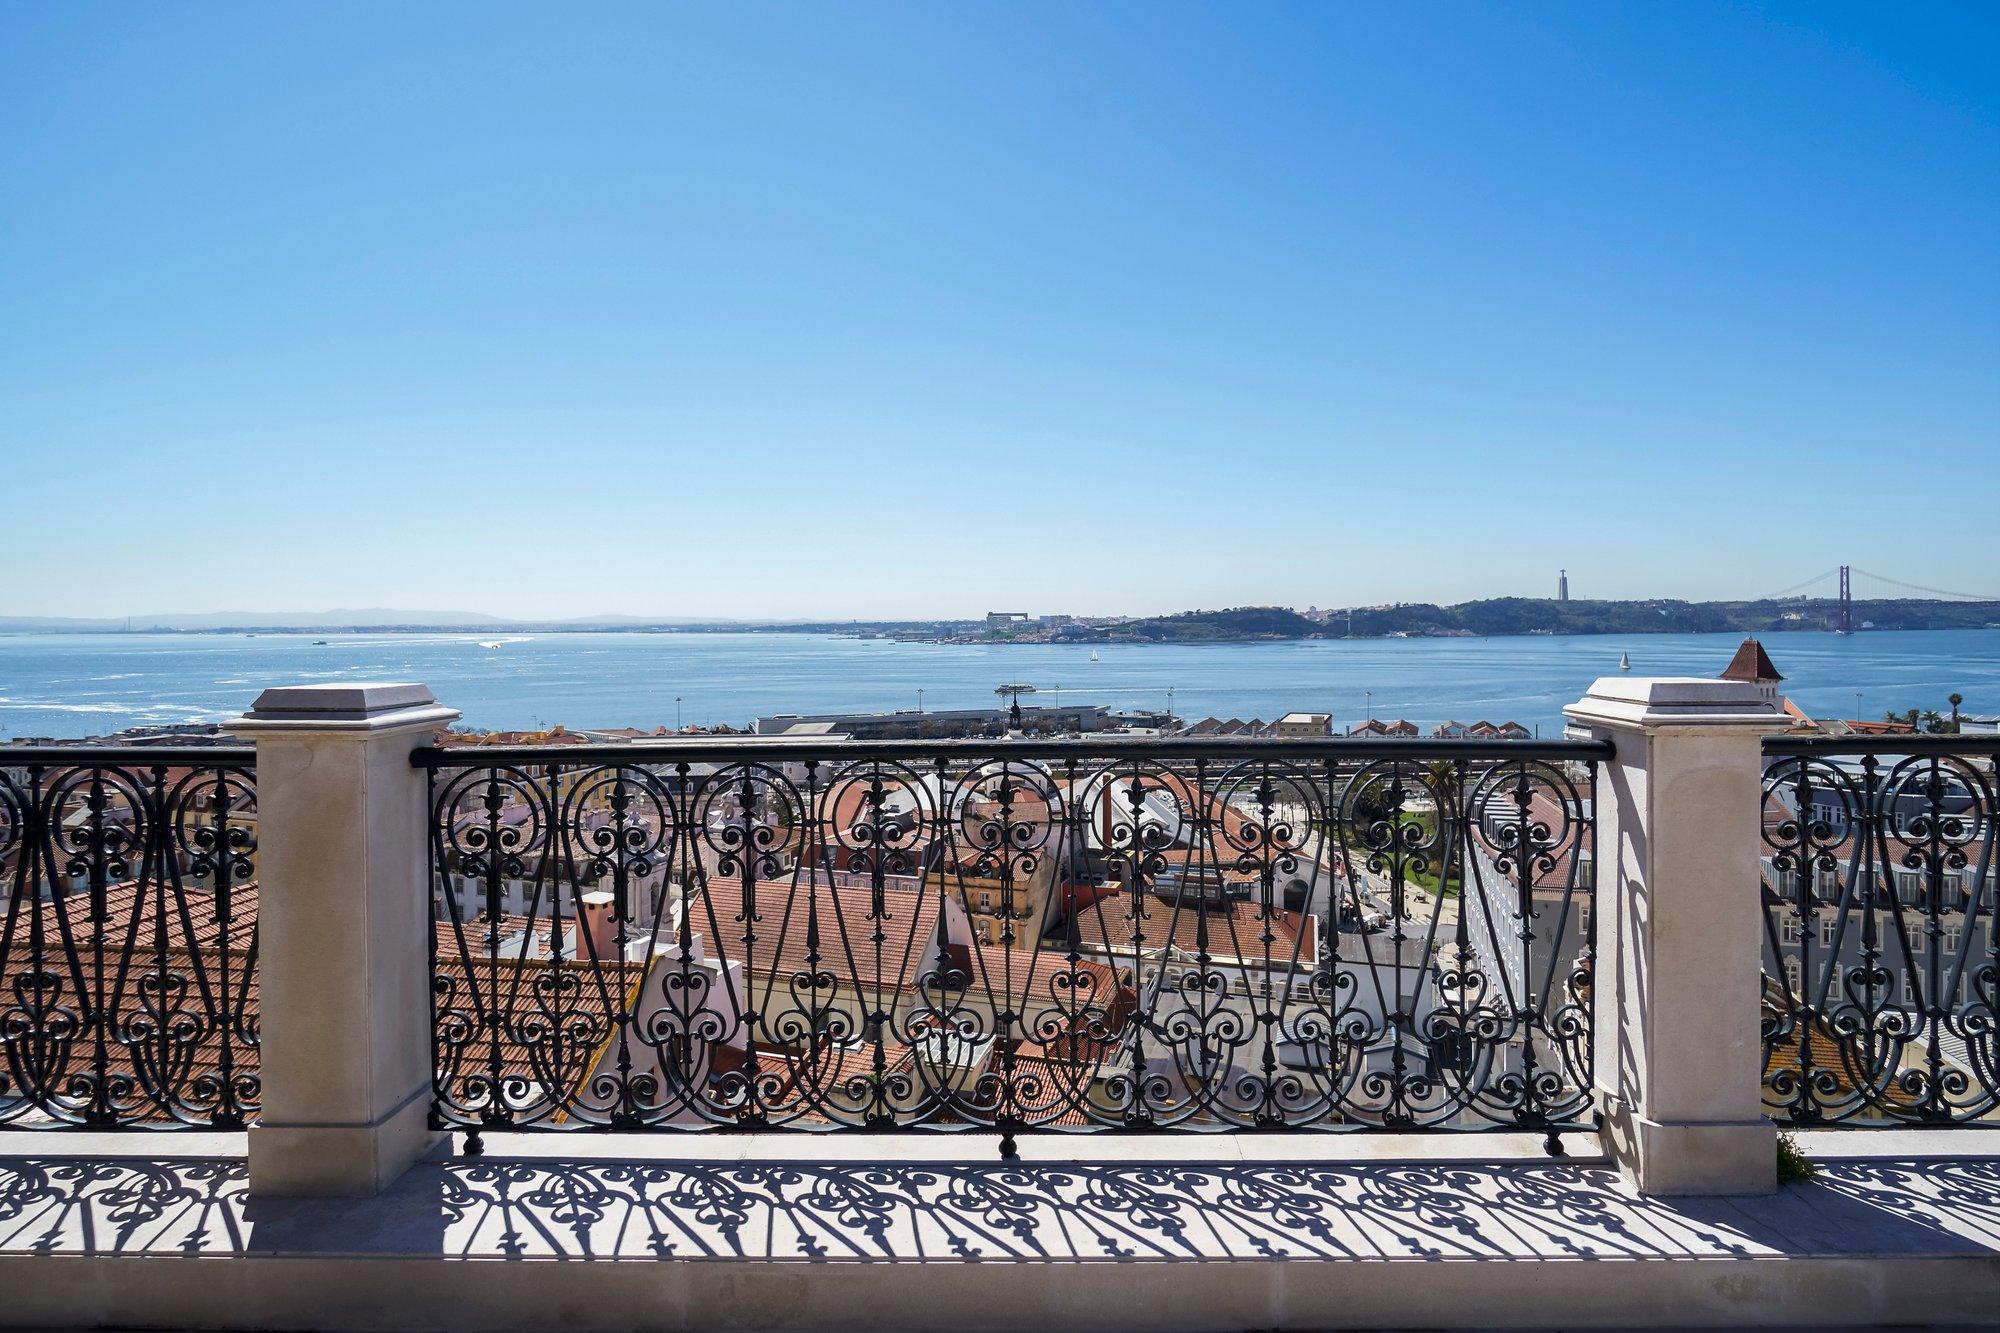 Lisbon, Portugal 1 - 10694621